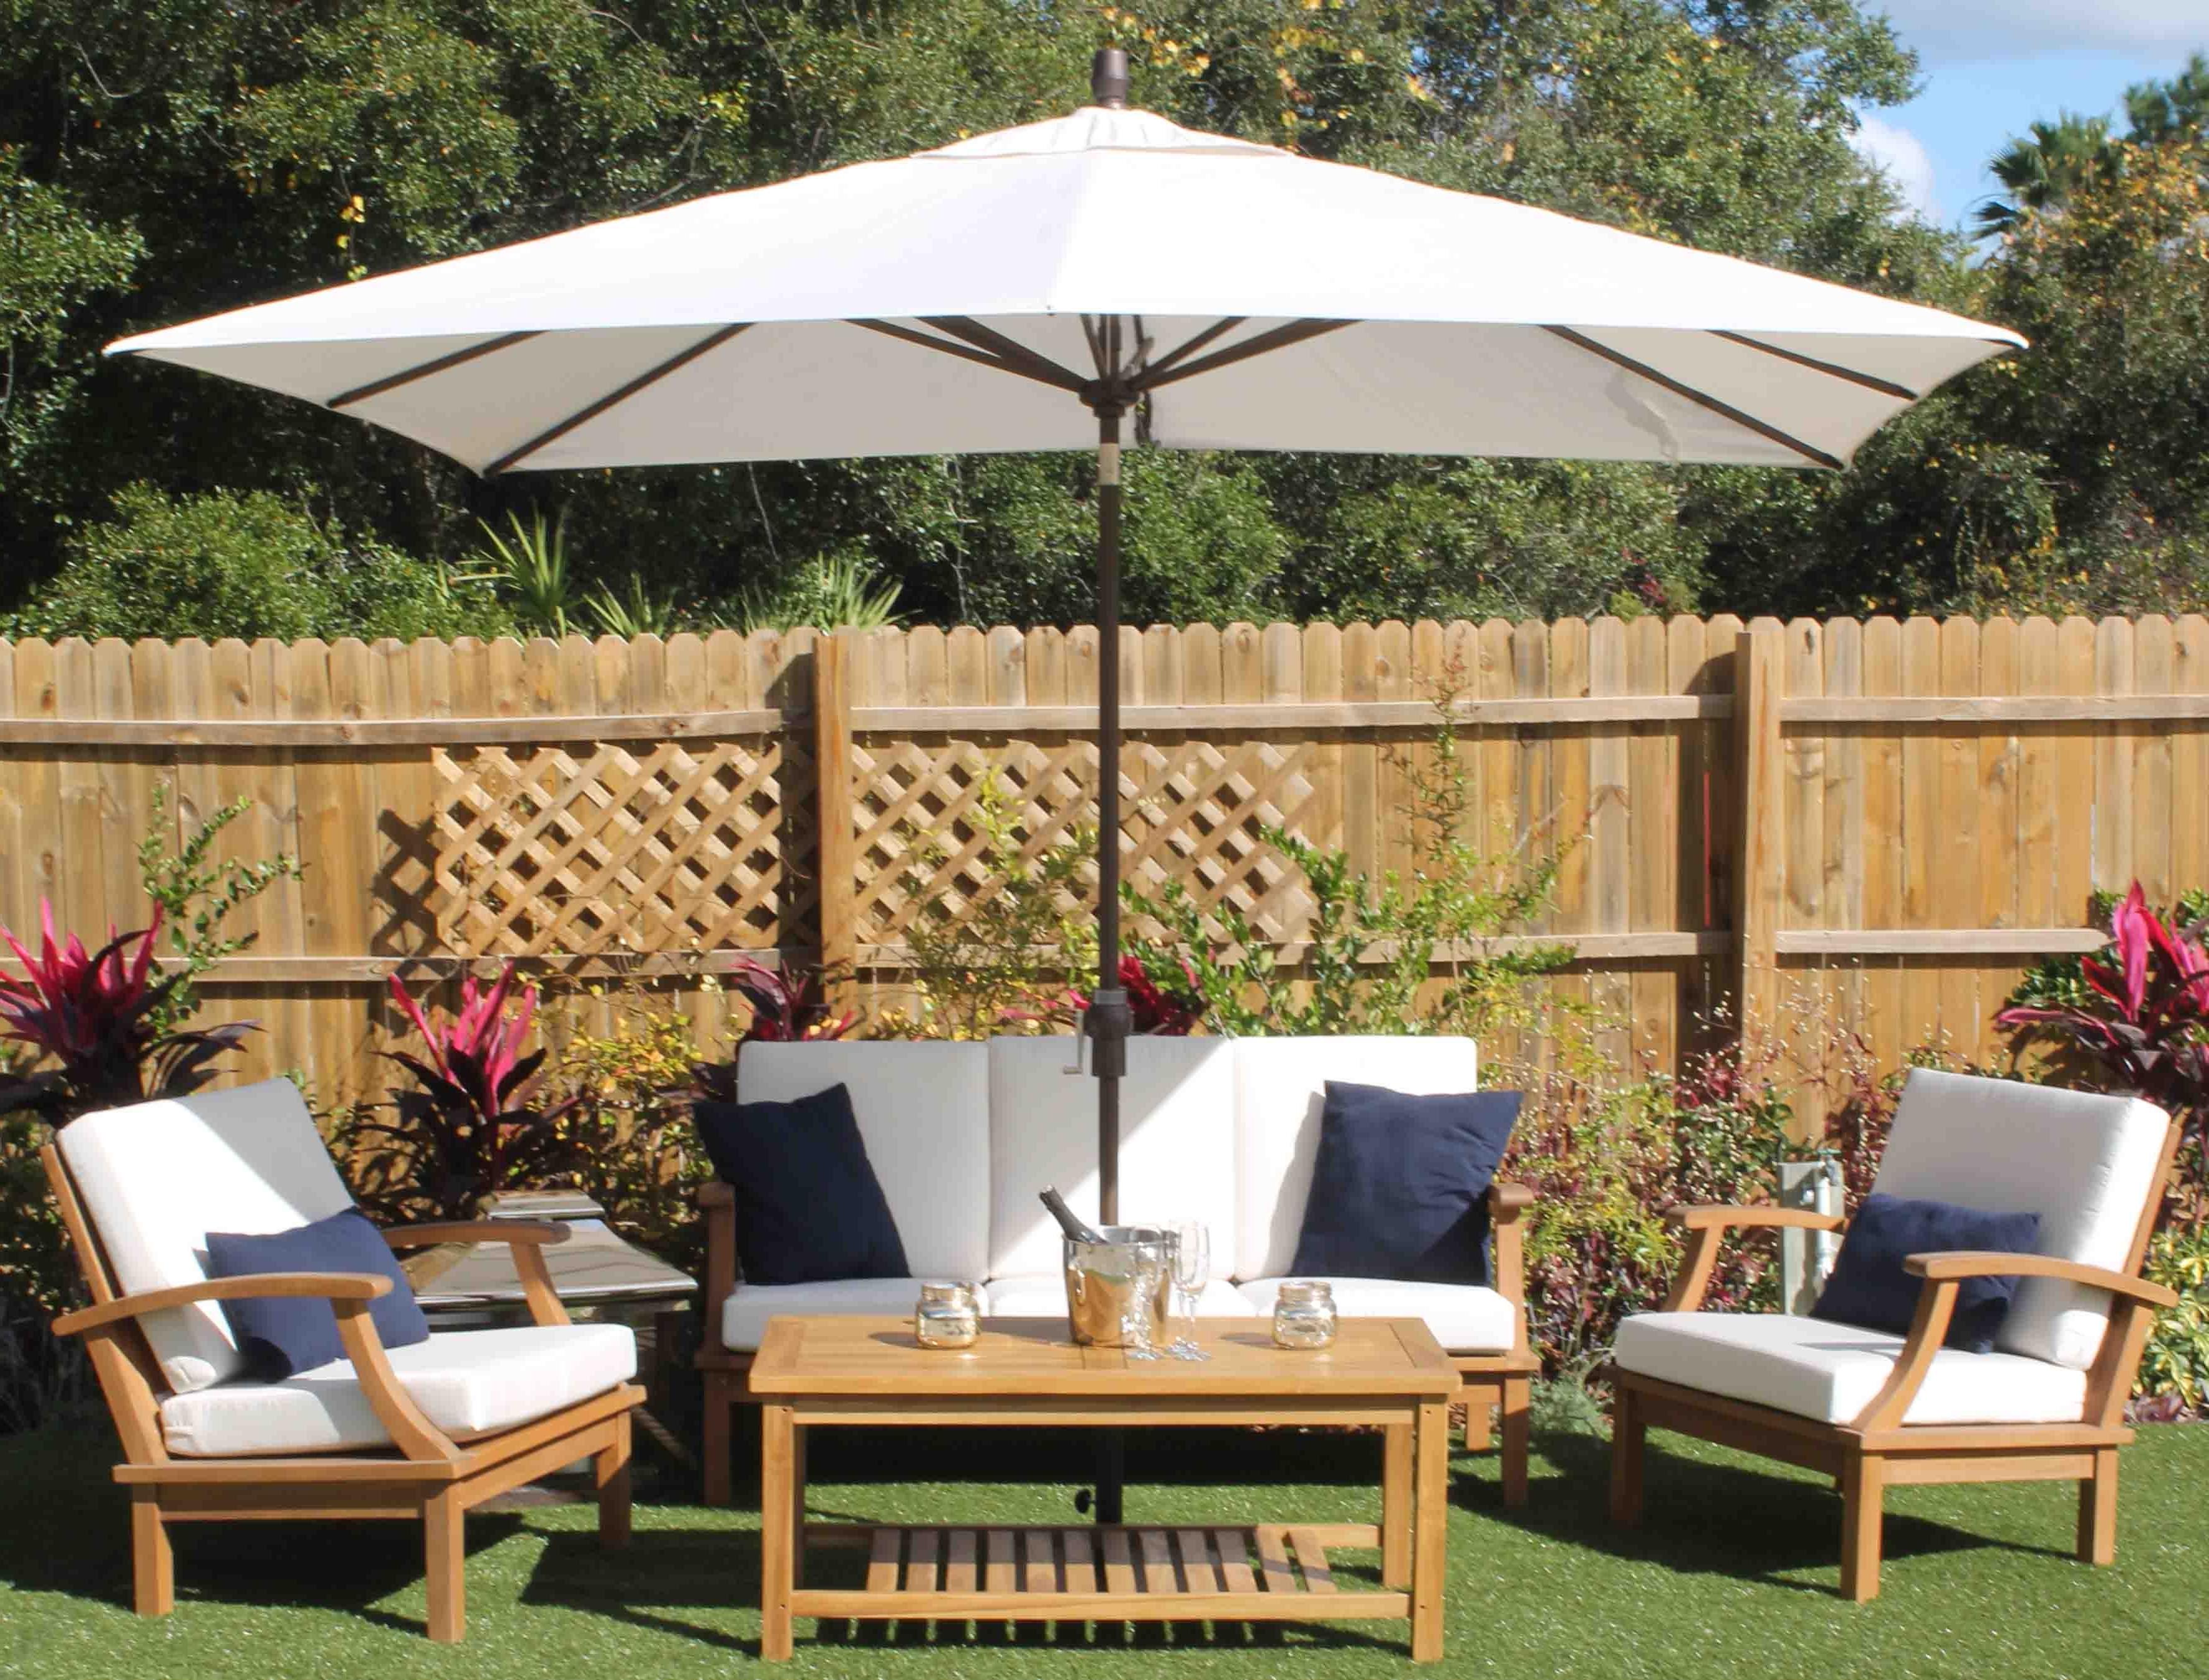 Most Popular Sunbrella Patio Umbrellas With 48 Rectangular Sunbrella Patio Umbrellas, 6#039; X 10#039; Sunbrella (View 6 of 20)